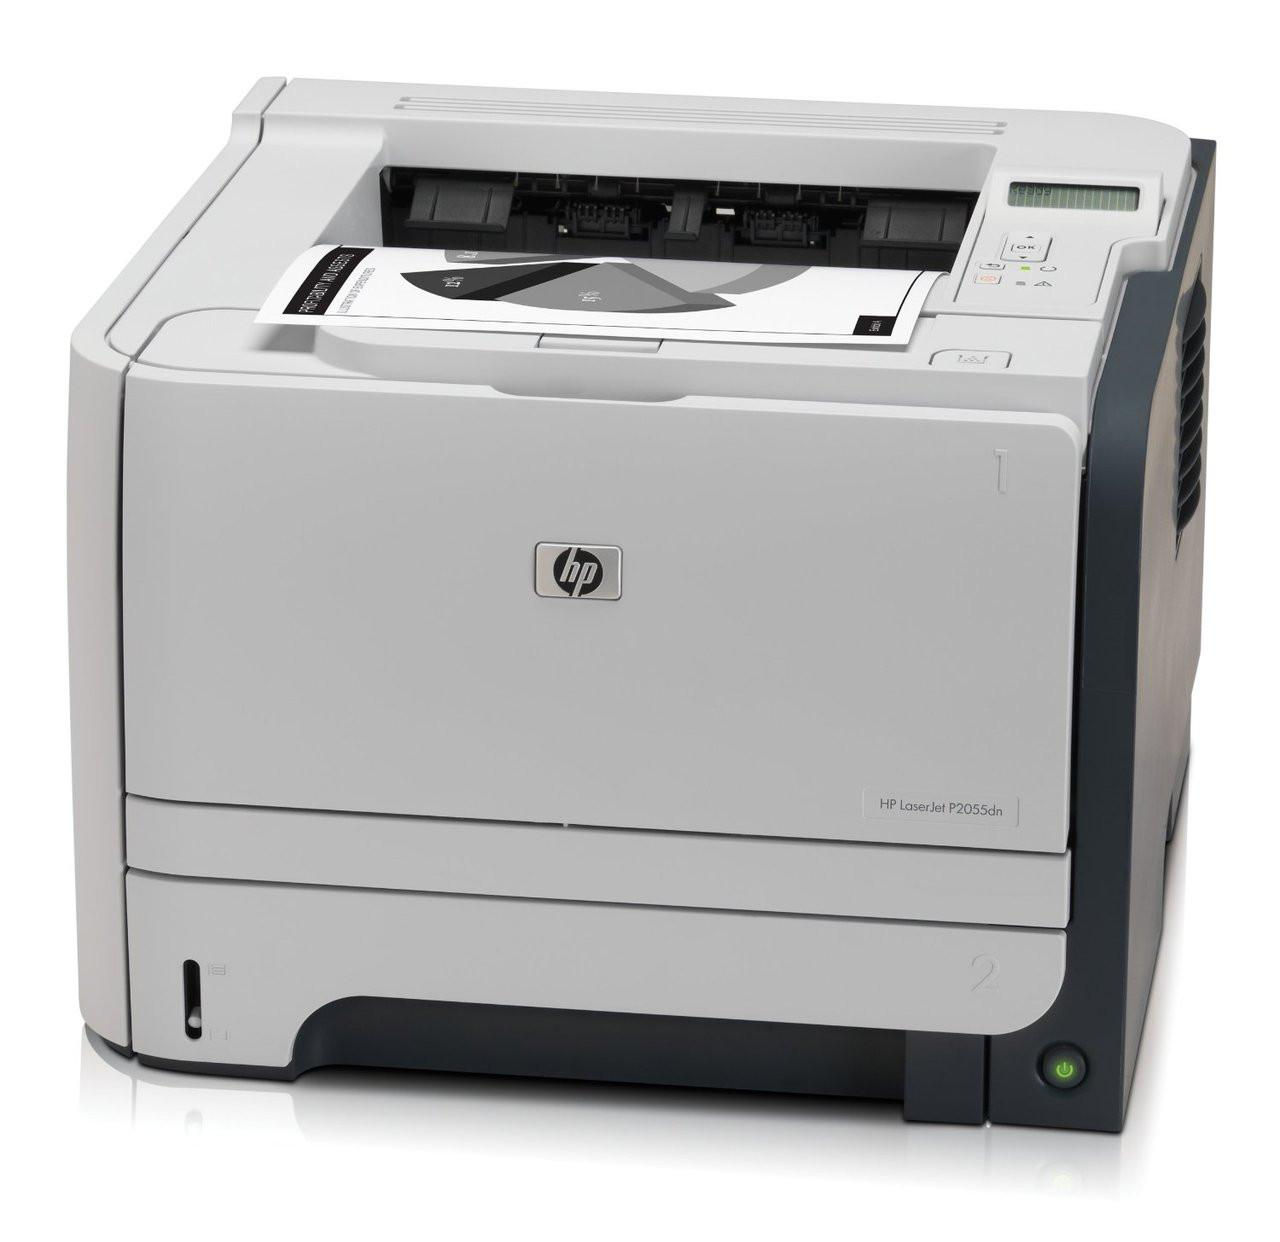 HP Laserjet P2055dn - CE459ARF - HP Laser Printer for sale